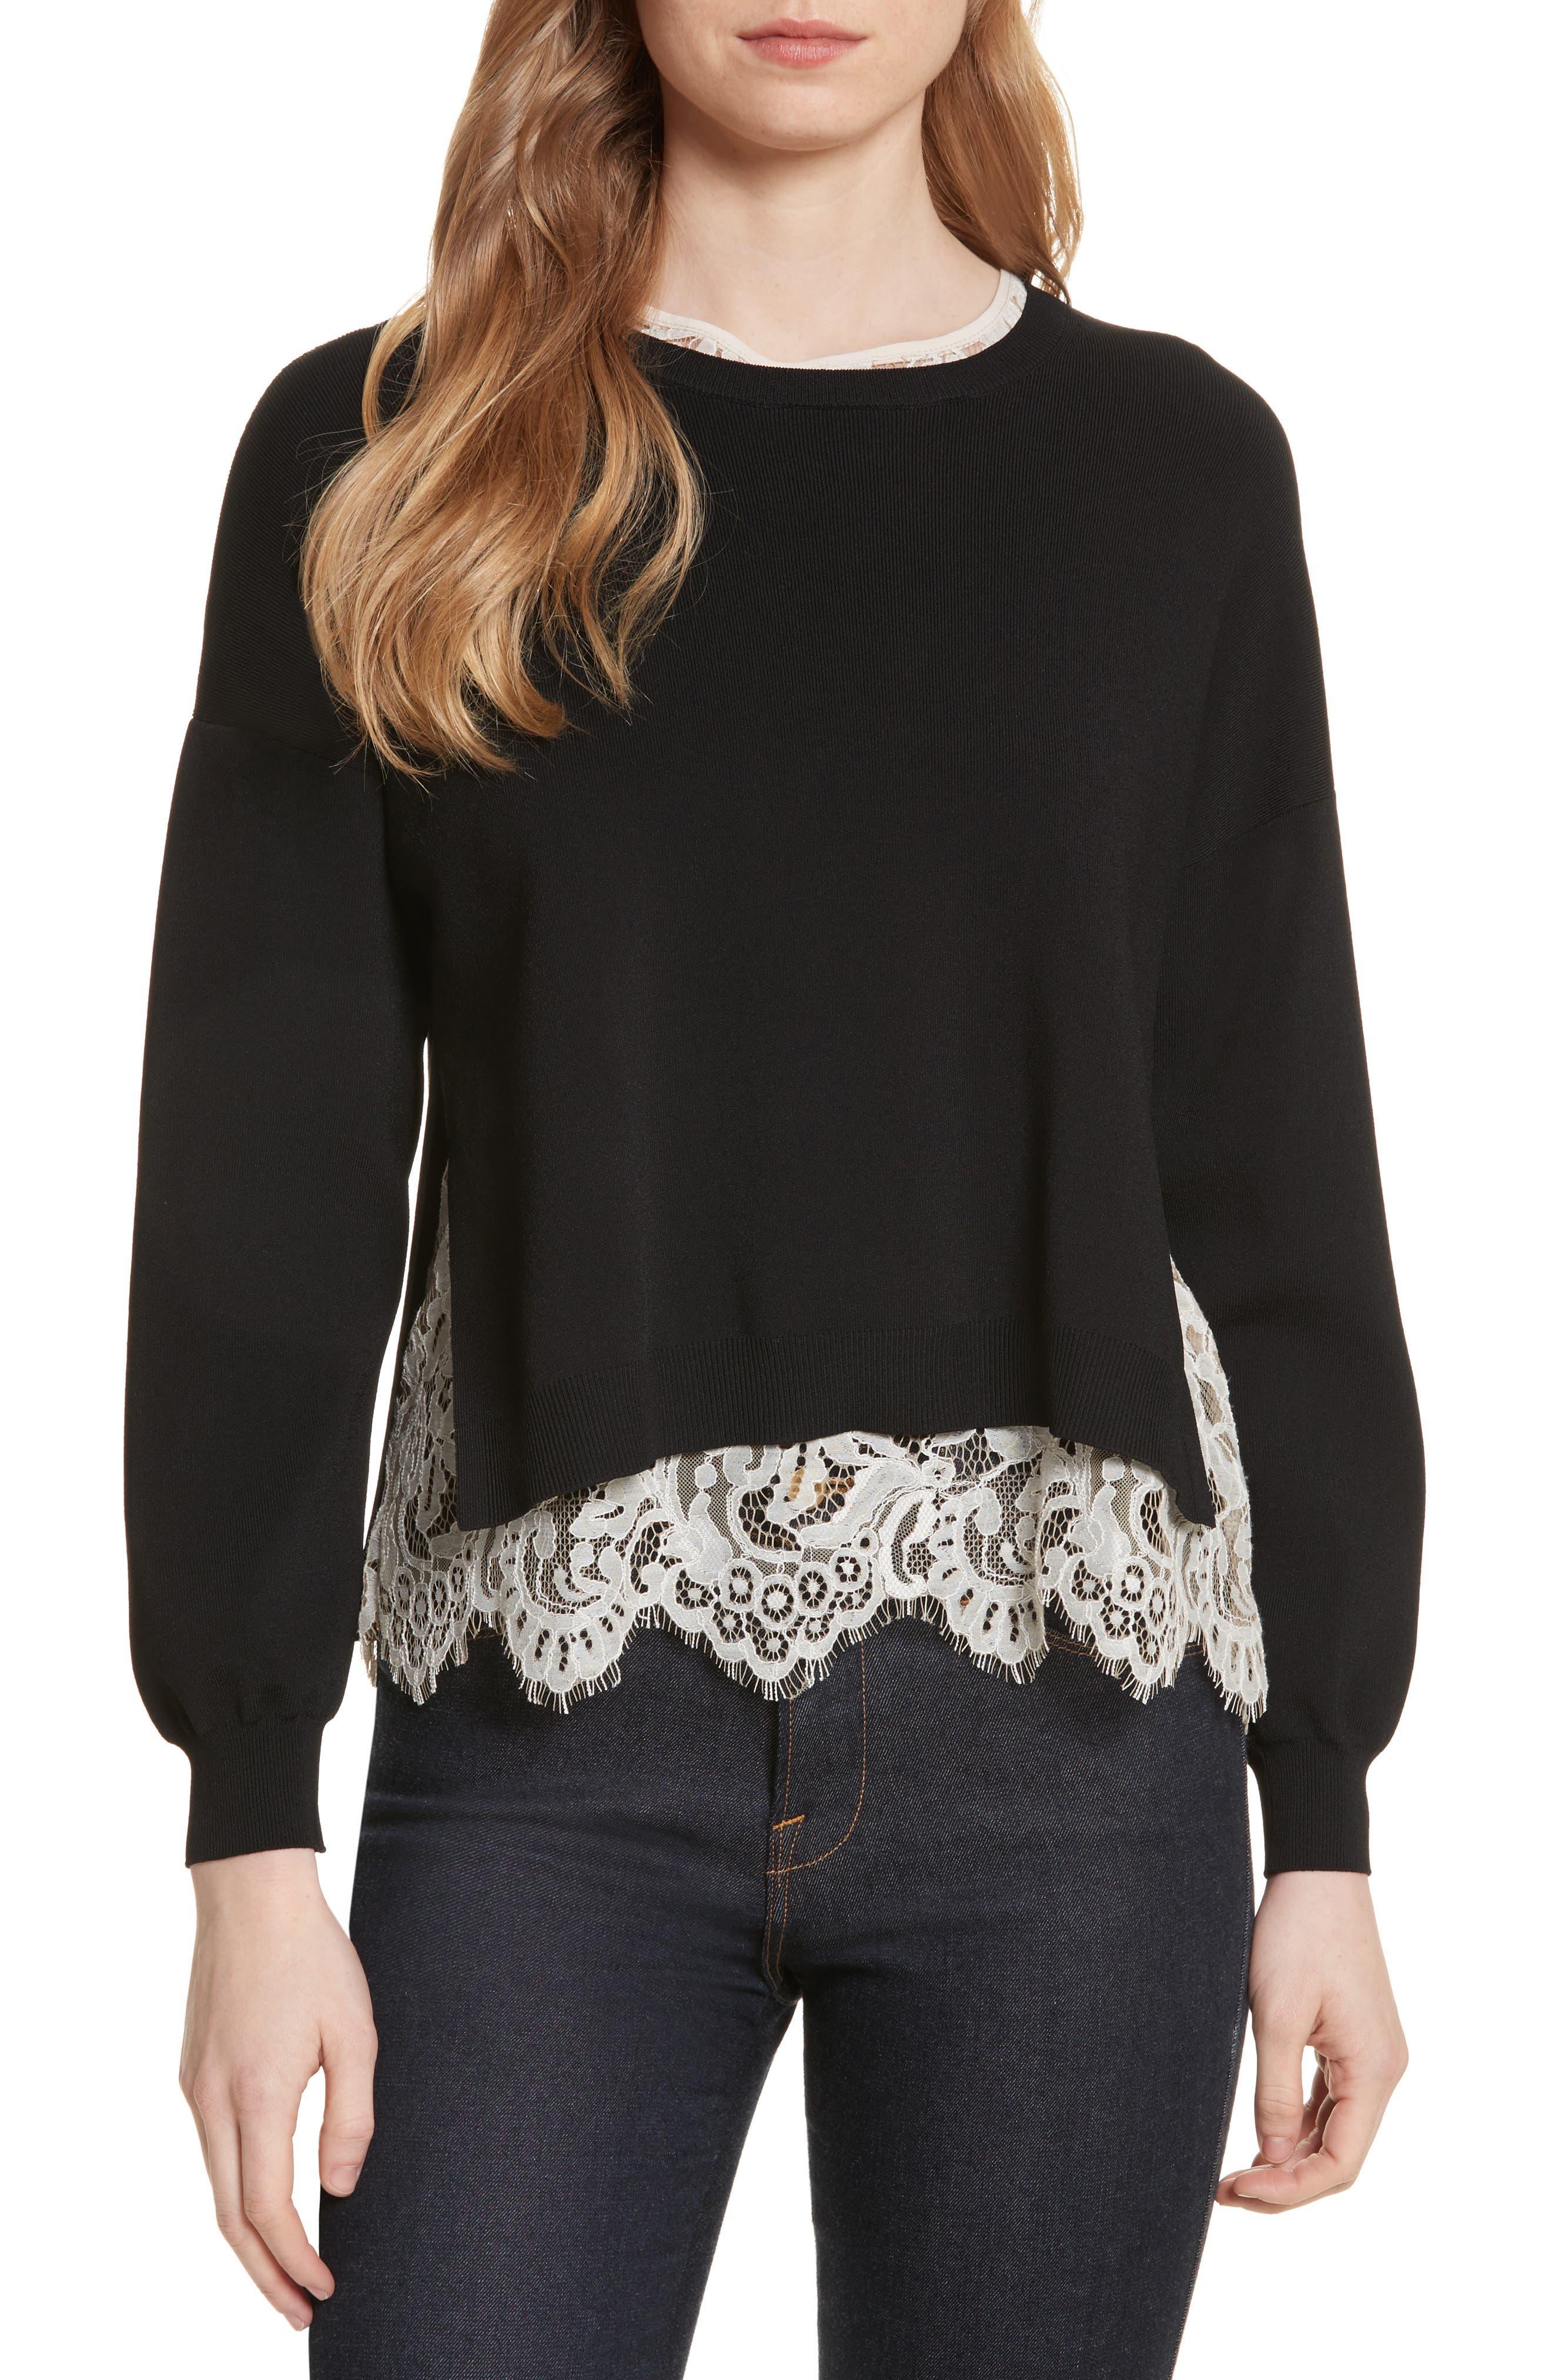 Alice + Olivia Iva Crewneck Lace Sweater